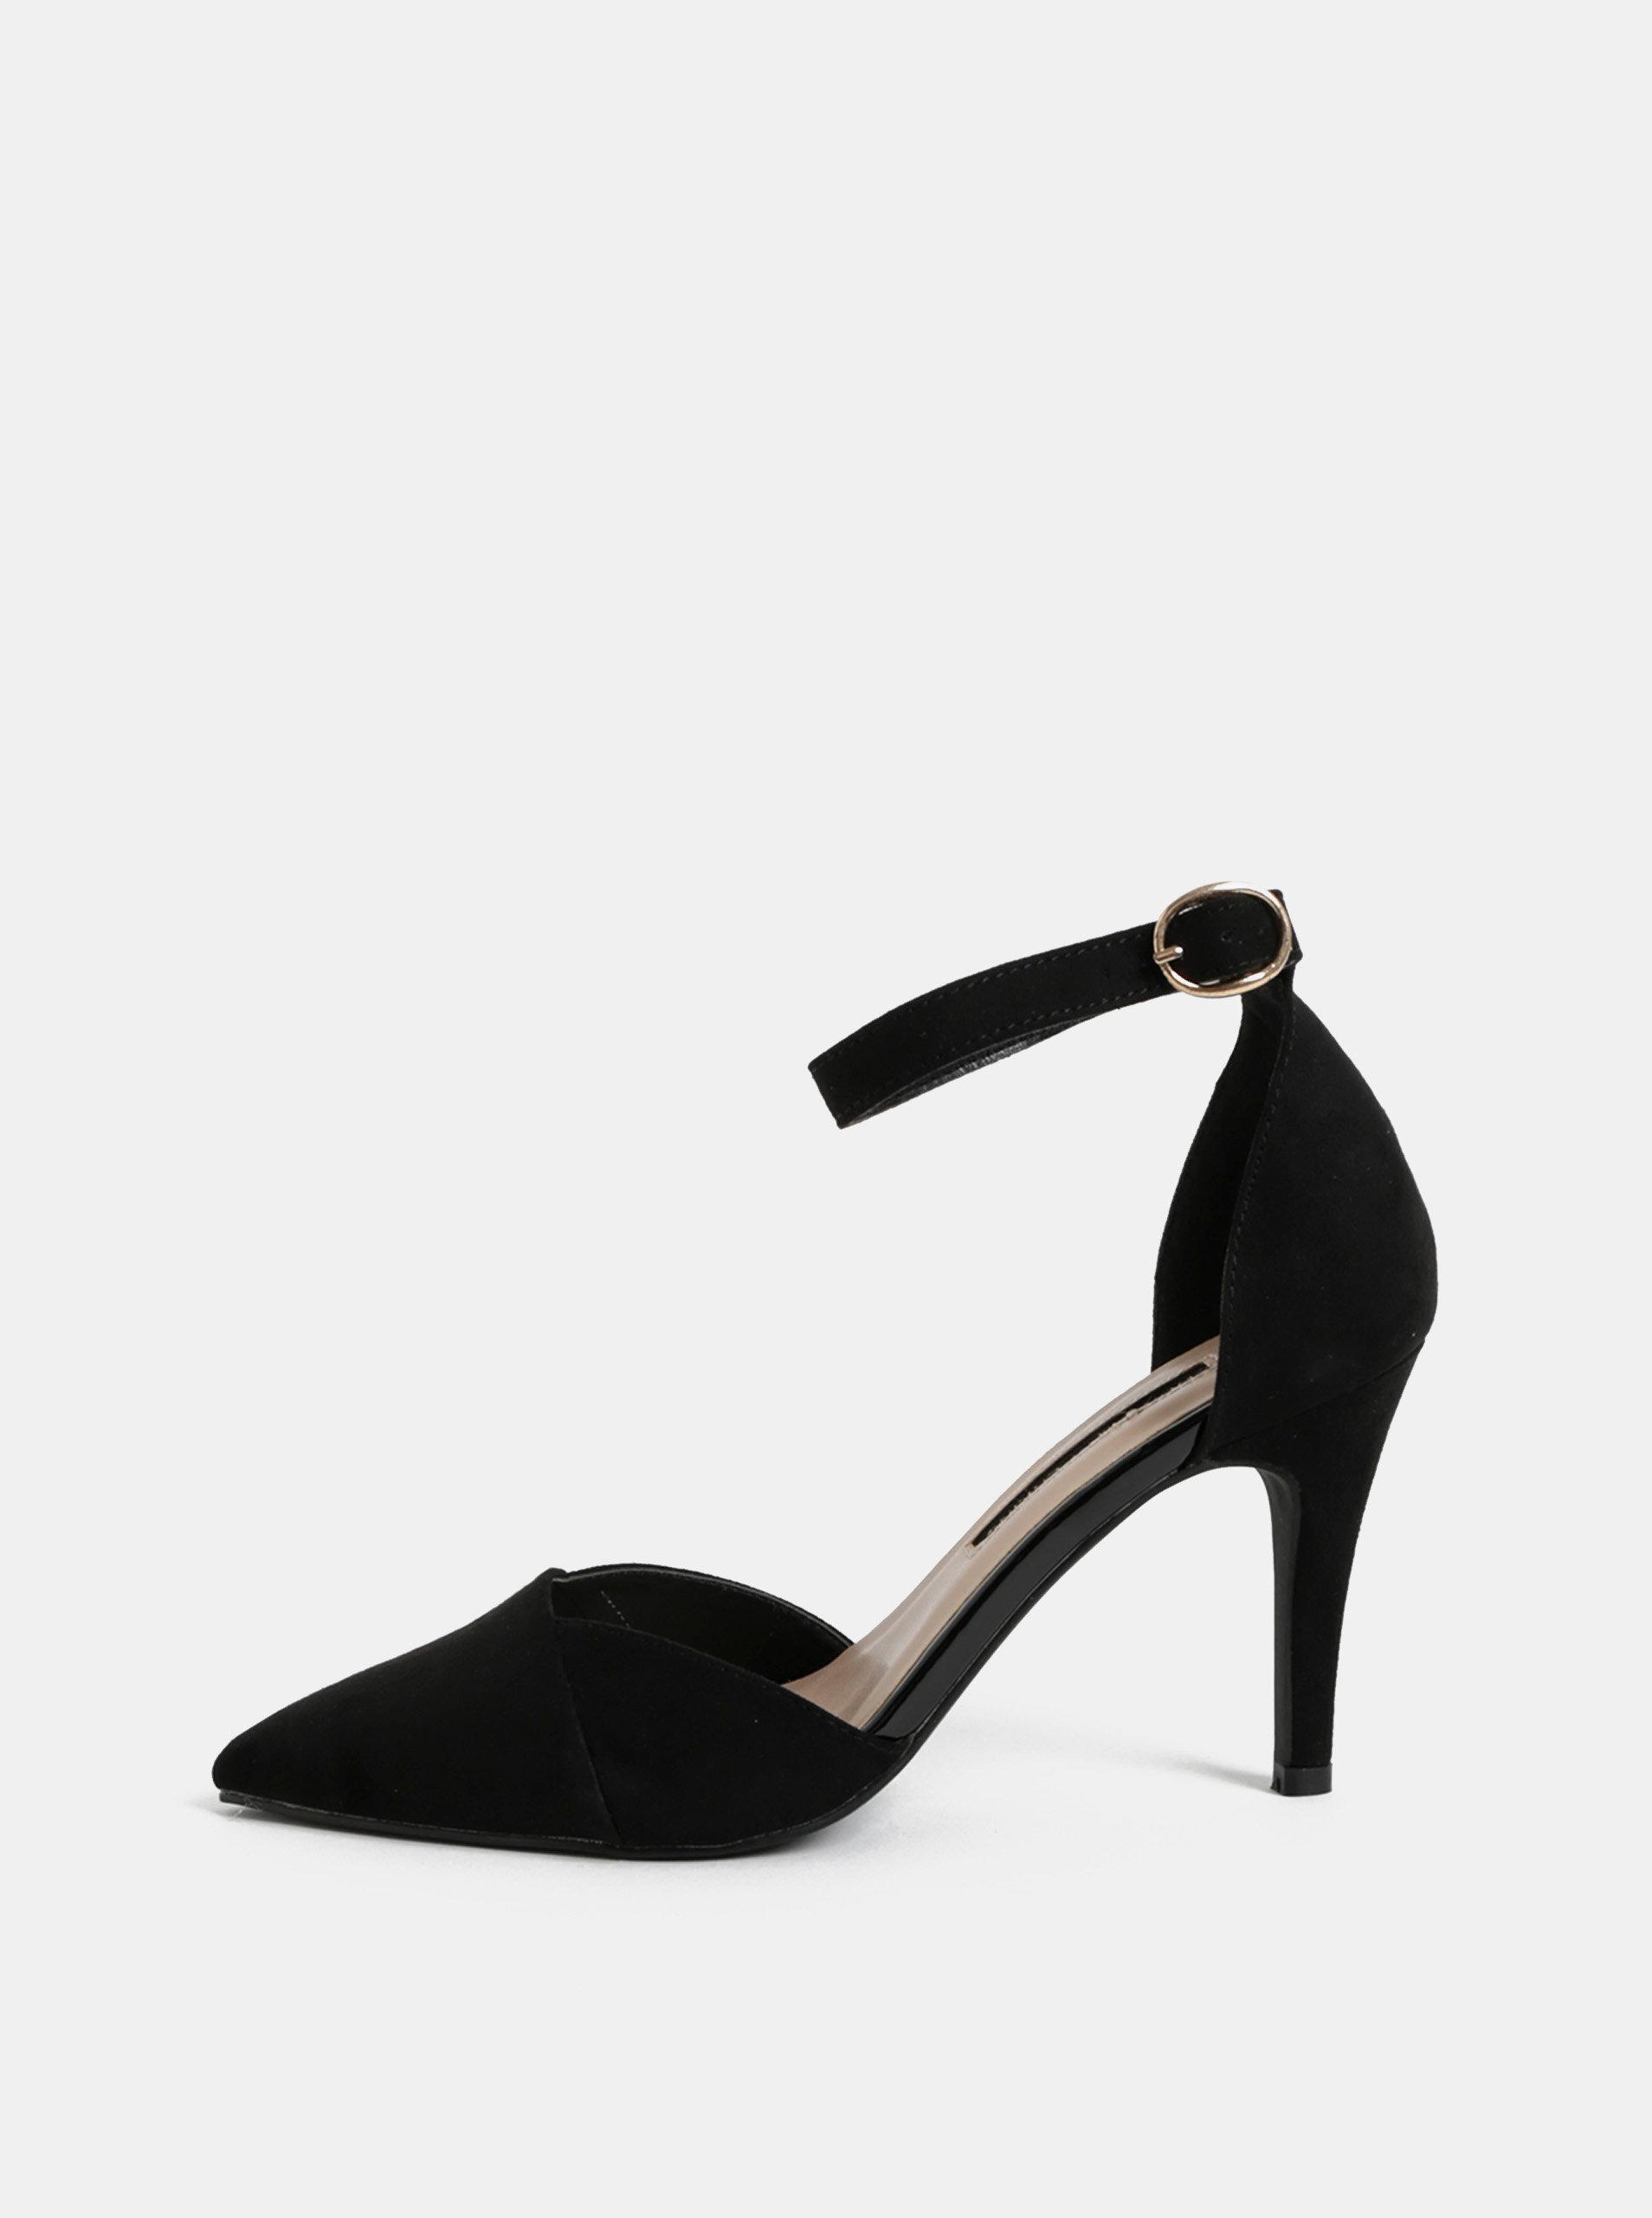 Černé sandály v semišové úpravě s plnou špičkou Dorothy Perkins Georgia